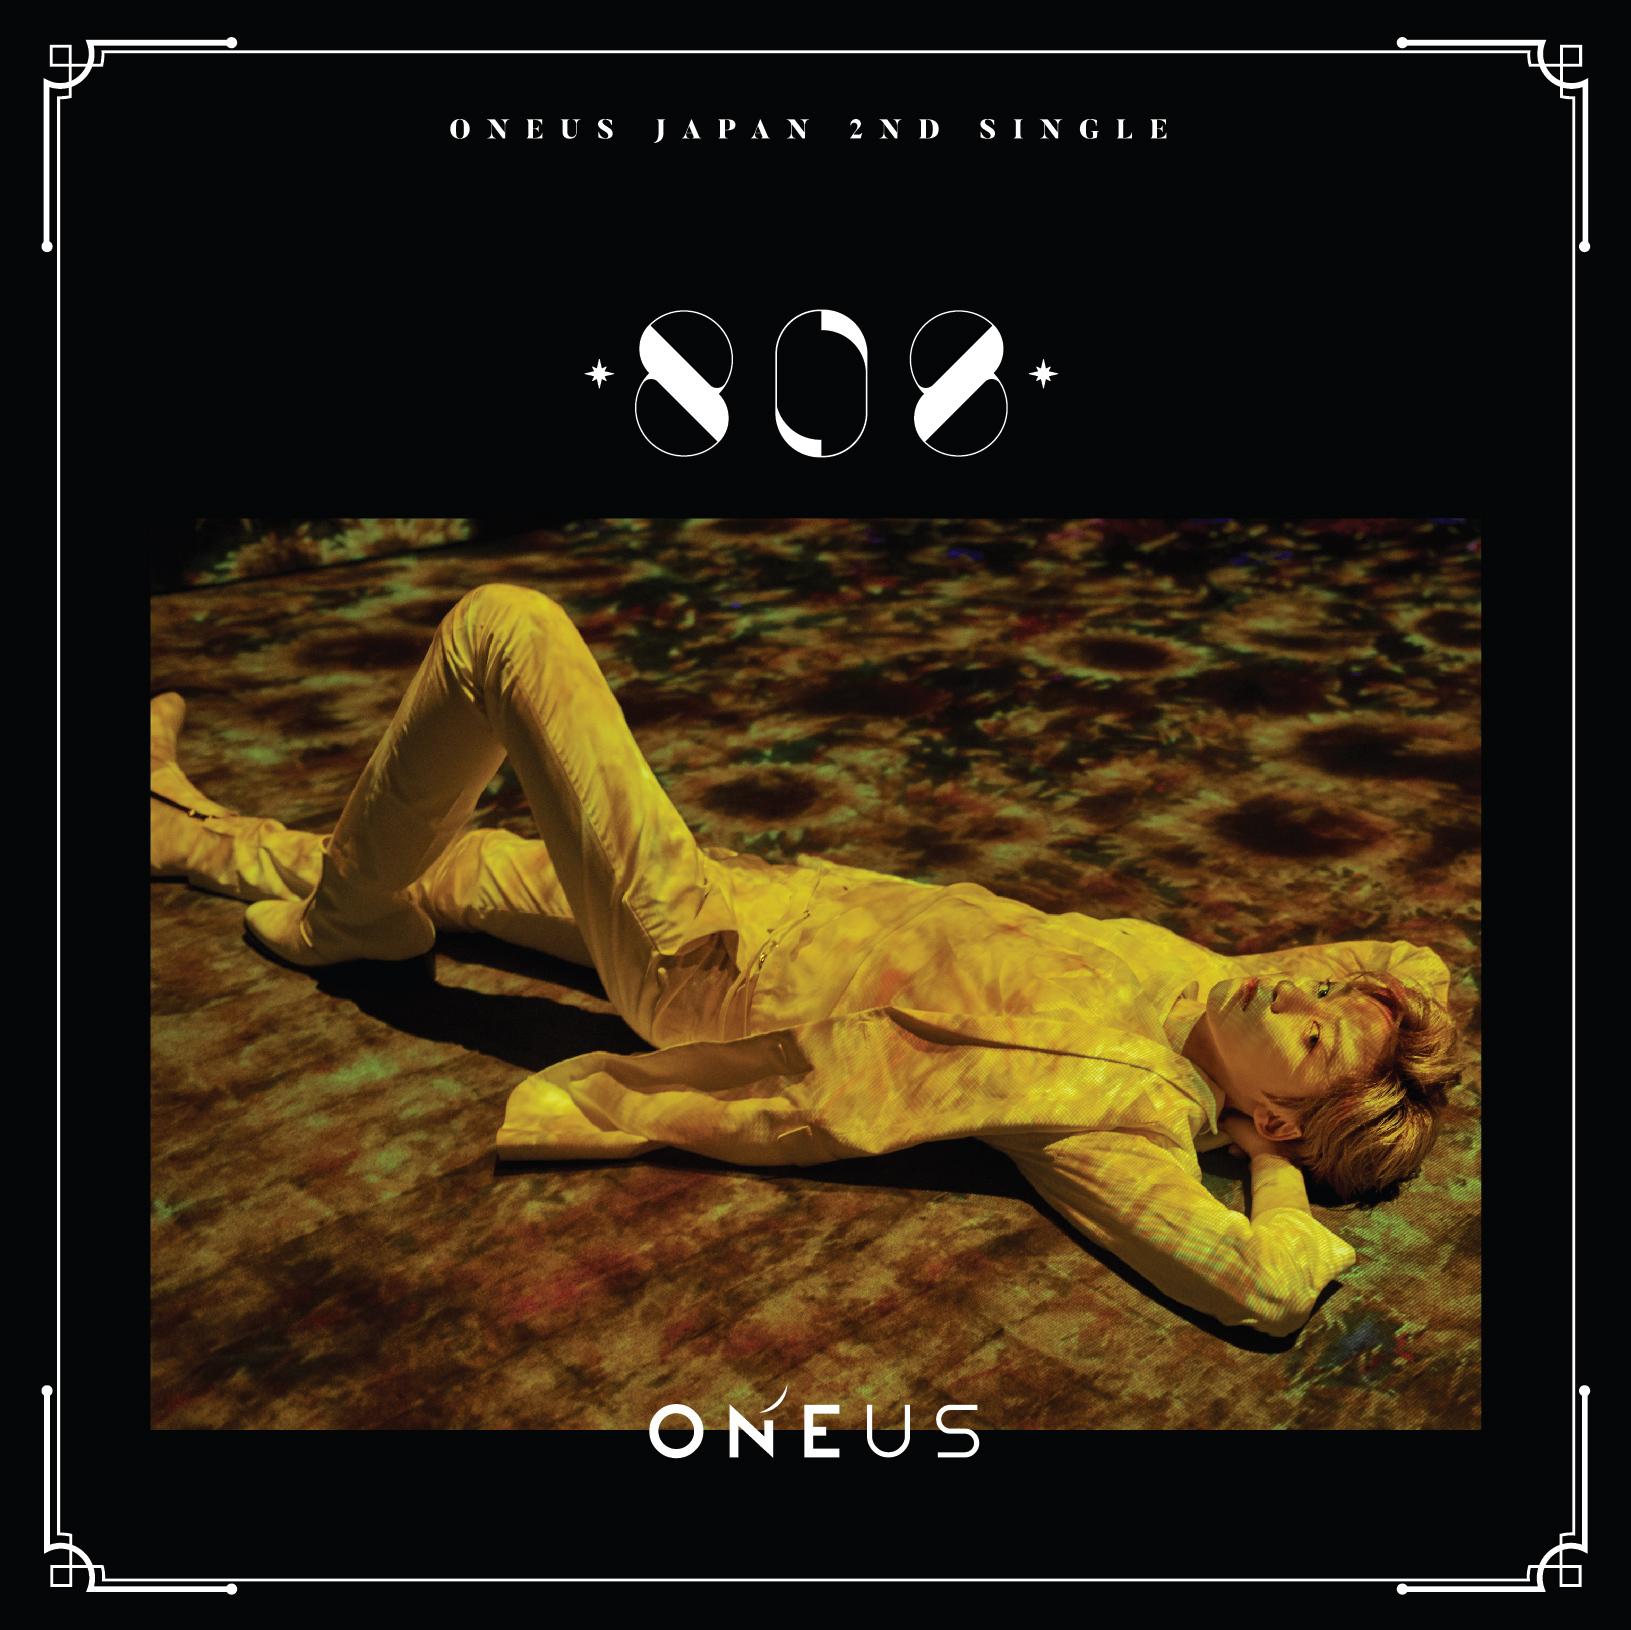 ONEUS Japan 2nd Single「808」メンバー別ジャケット盤(コンヒ)